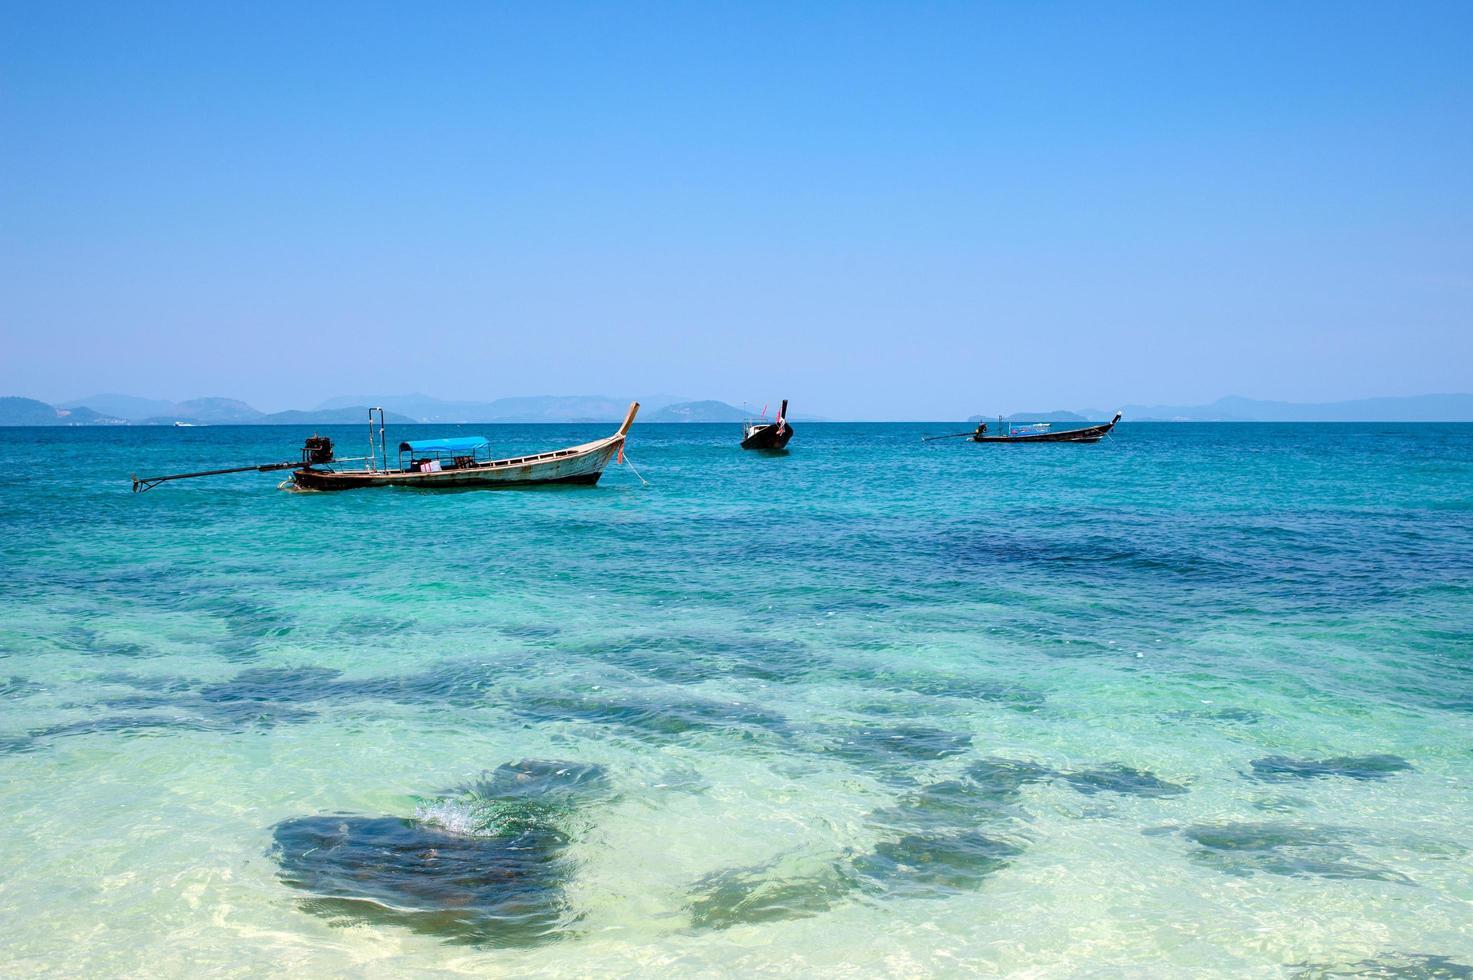 vissersboten op het strand phuket, thailand foto